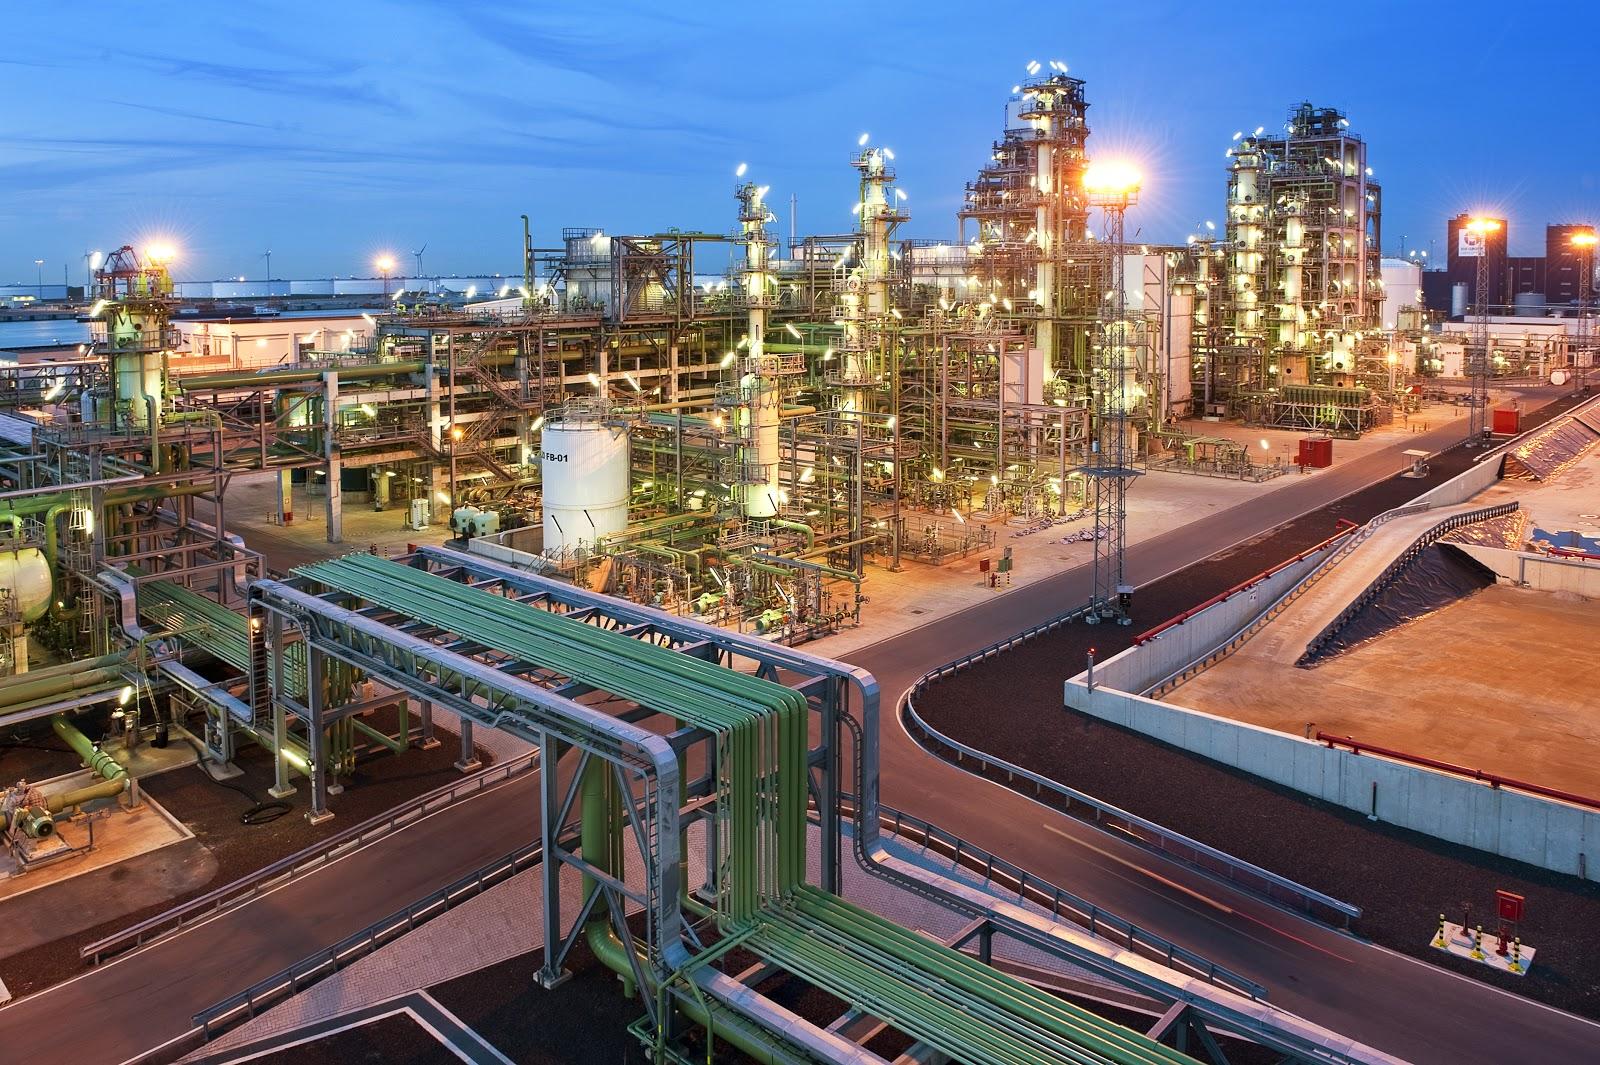 rotterdam_refinery